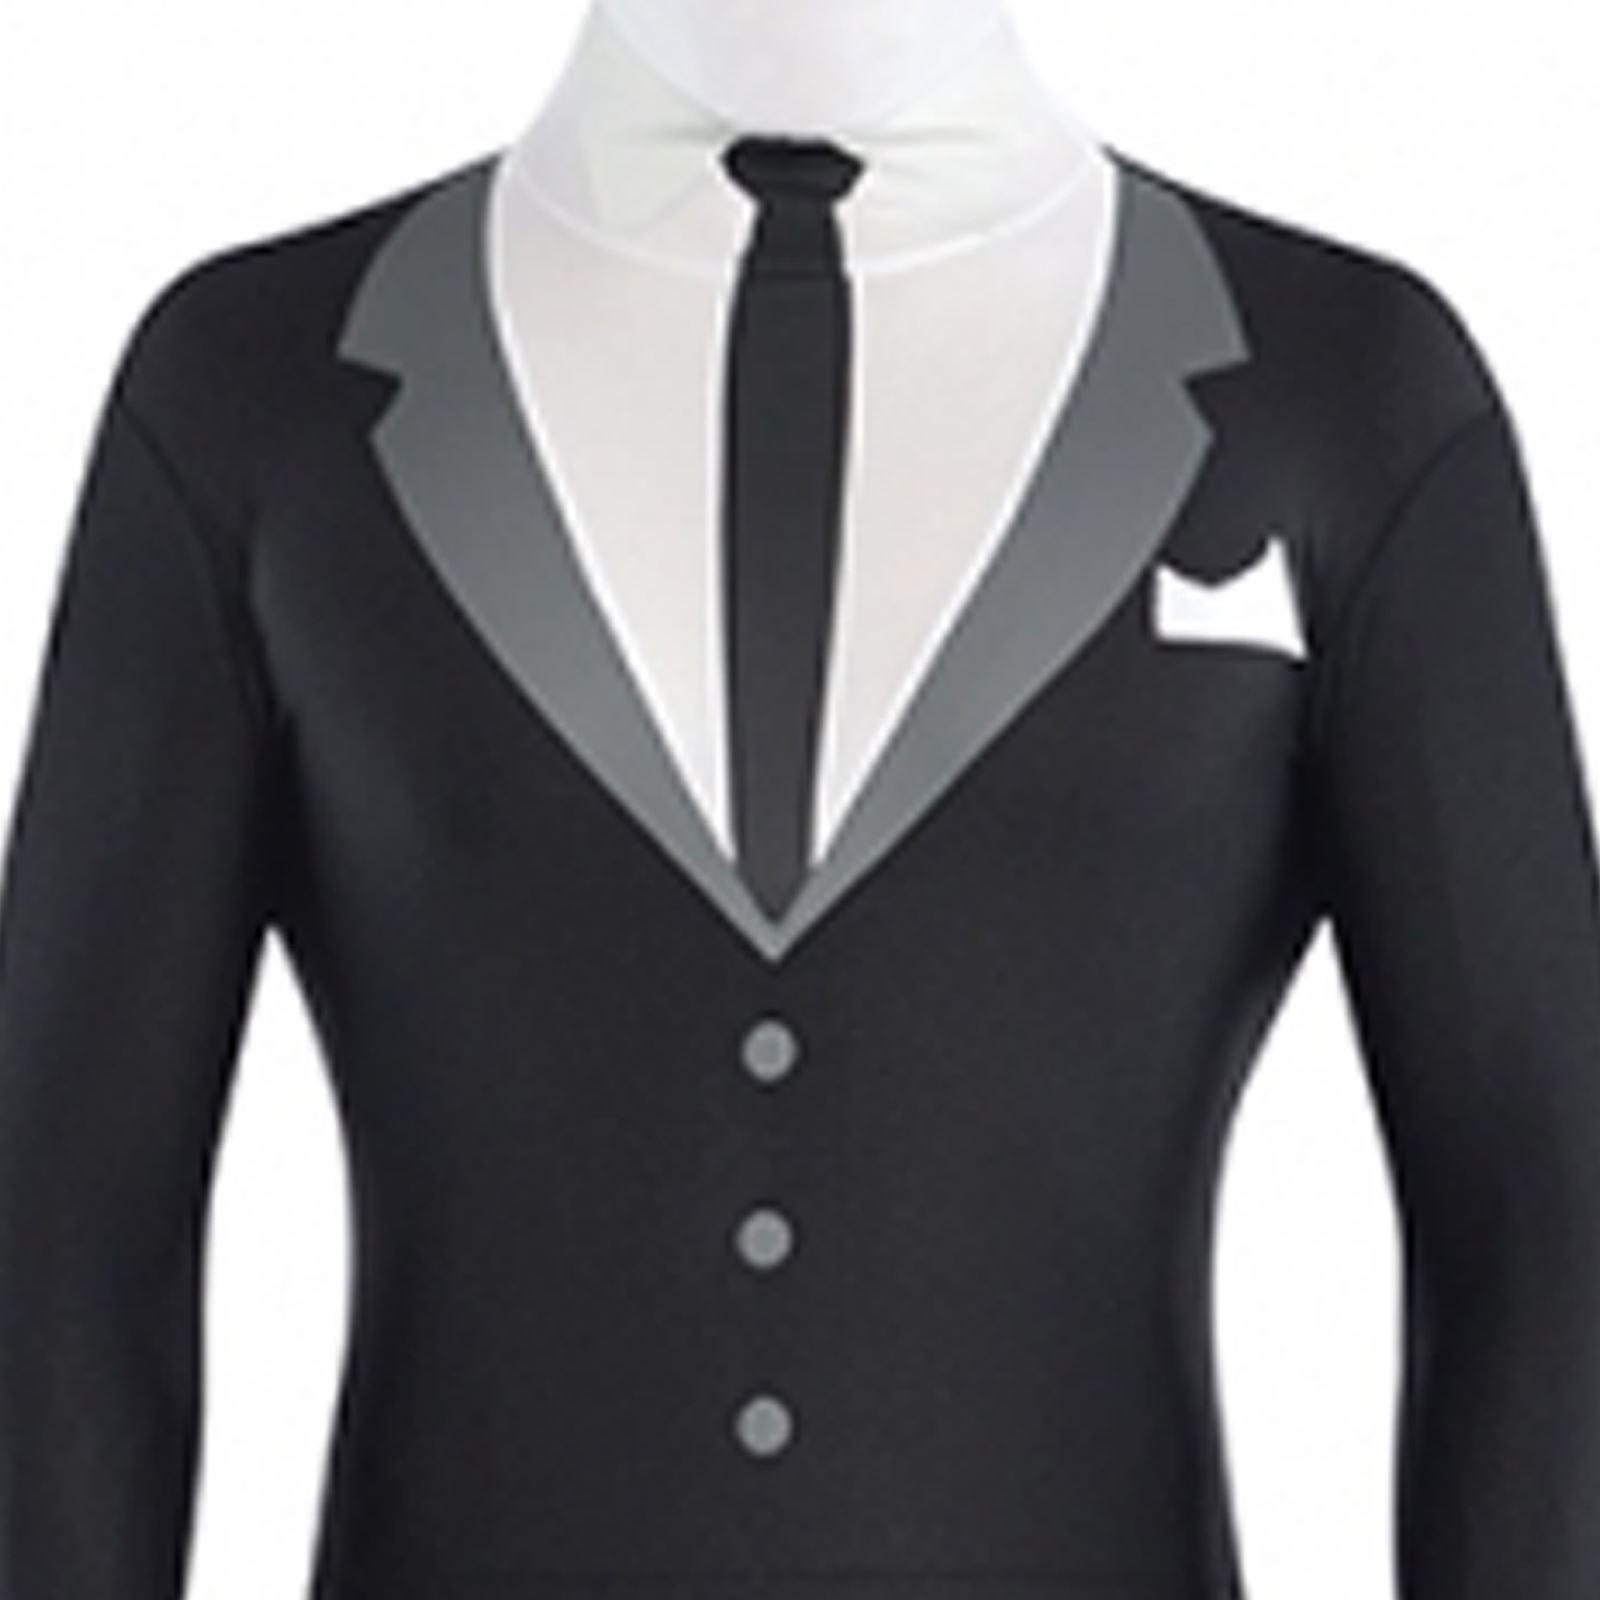 halloween spandex body suit tux teen men fancy dress scary costume slenderman bn ebay - Halloween Costume Slender Man